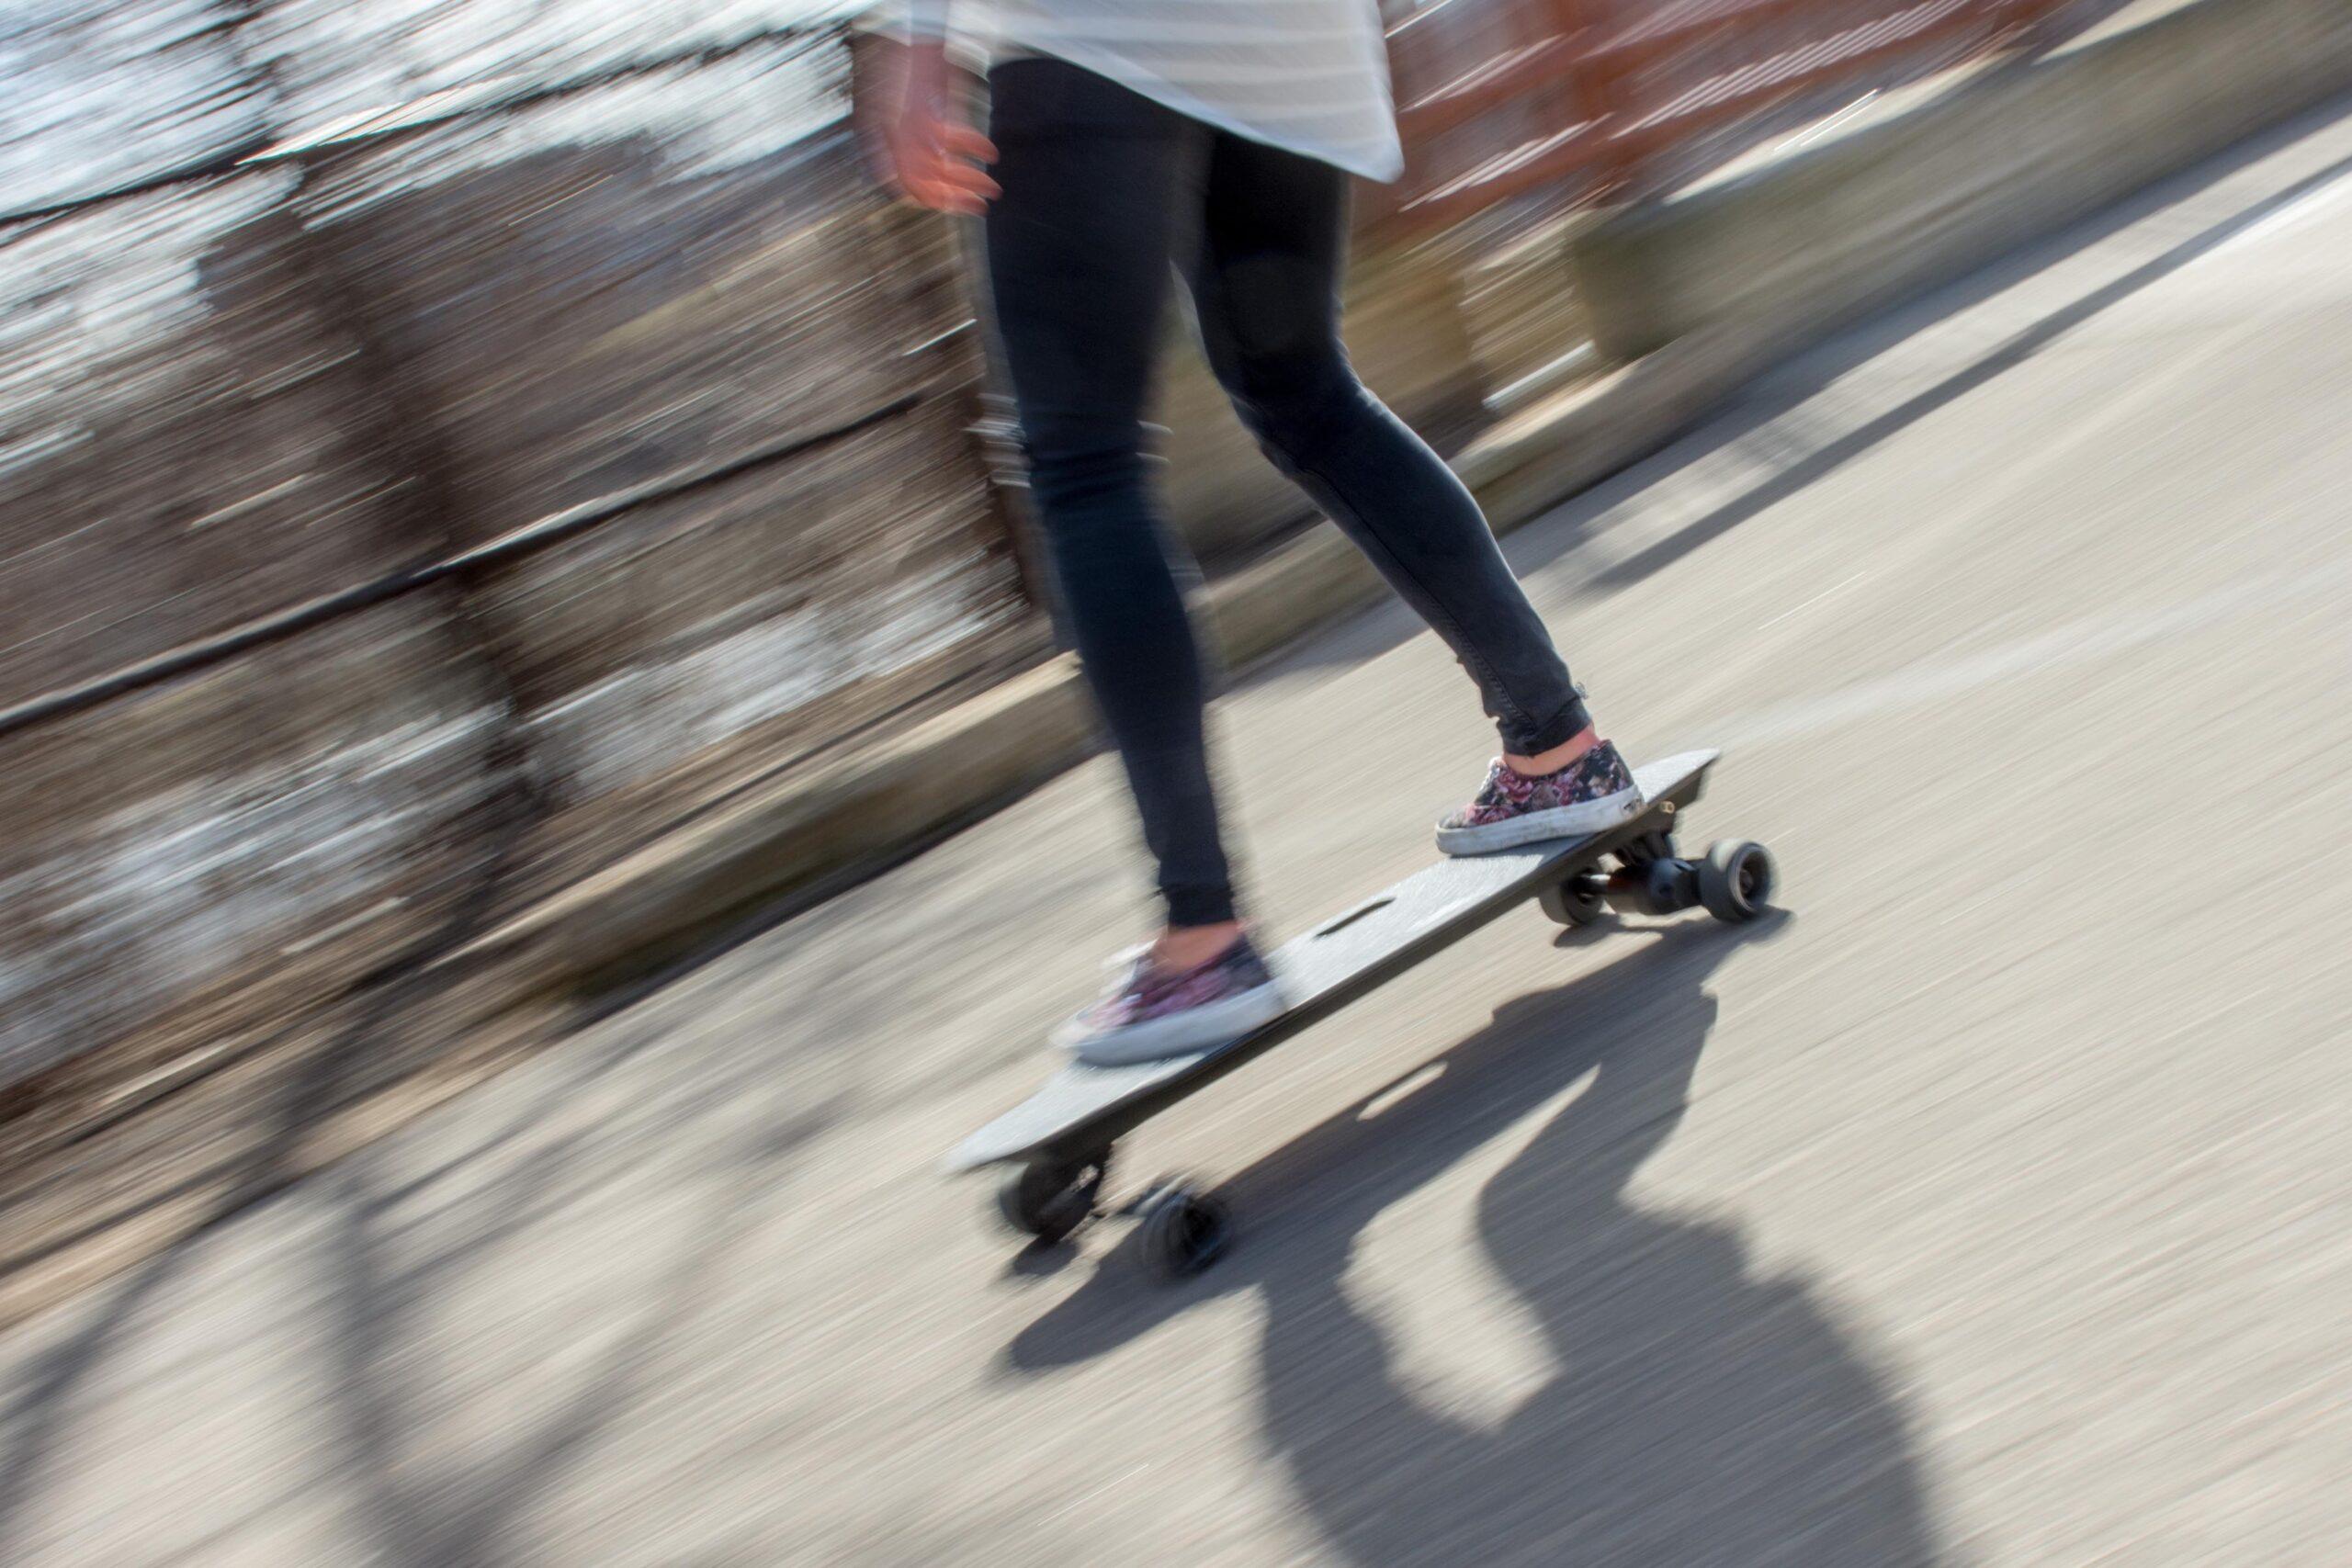 marketing photography minneapolis minnesota skateboard